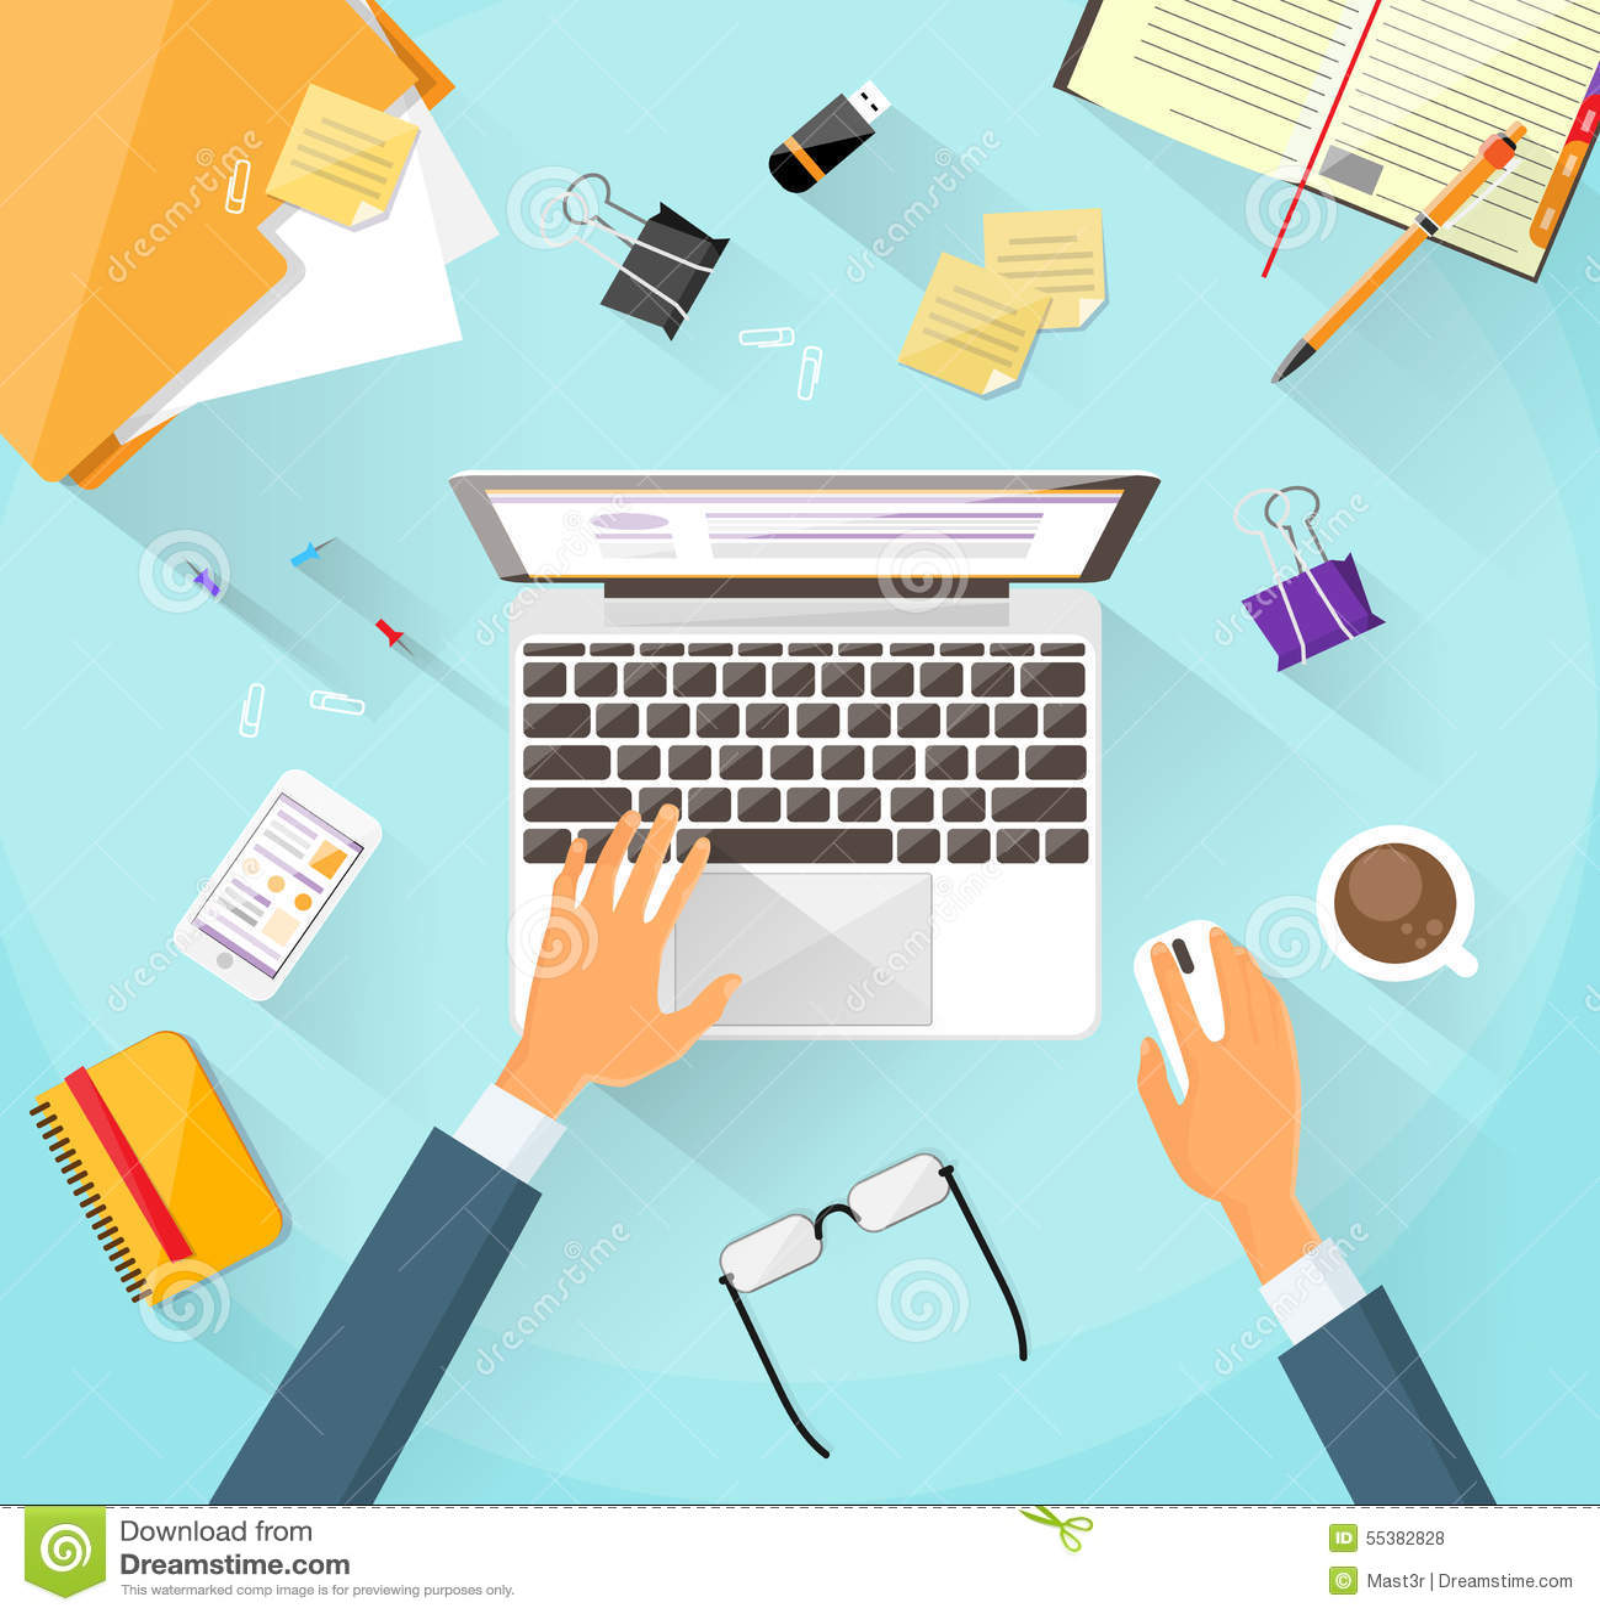 Businessman Workplace Desk Hands Working Laptop Stock